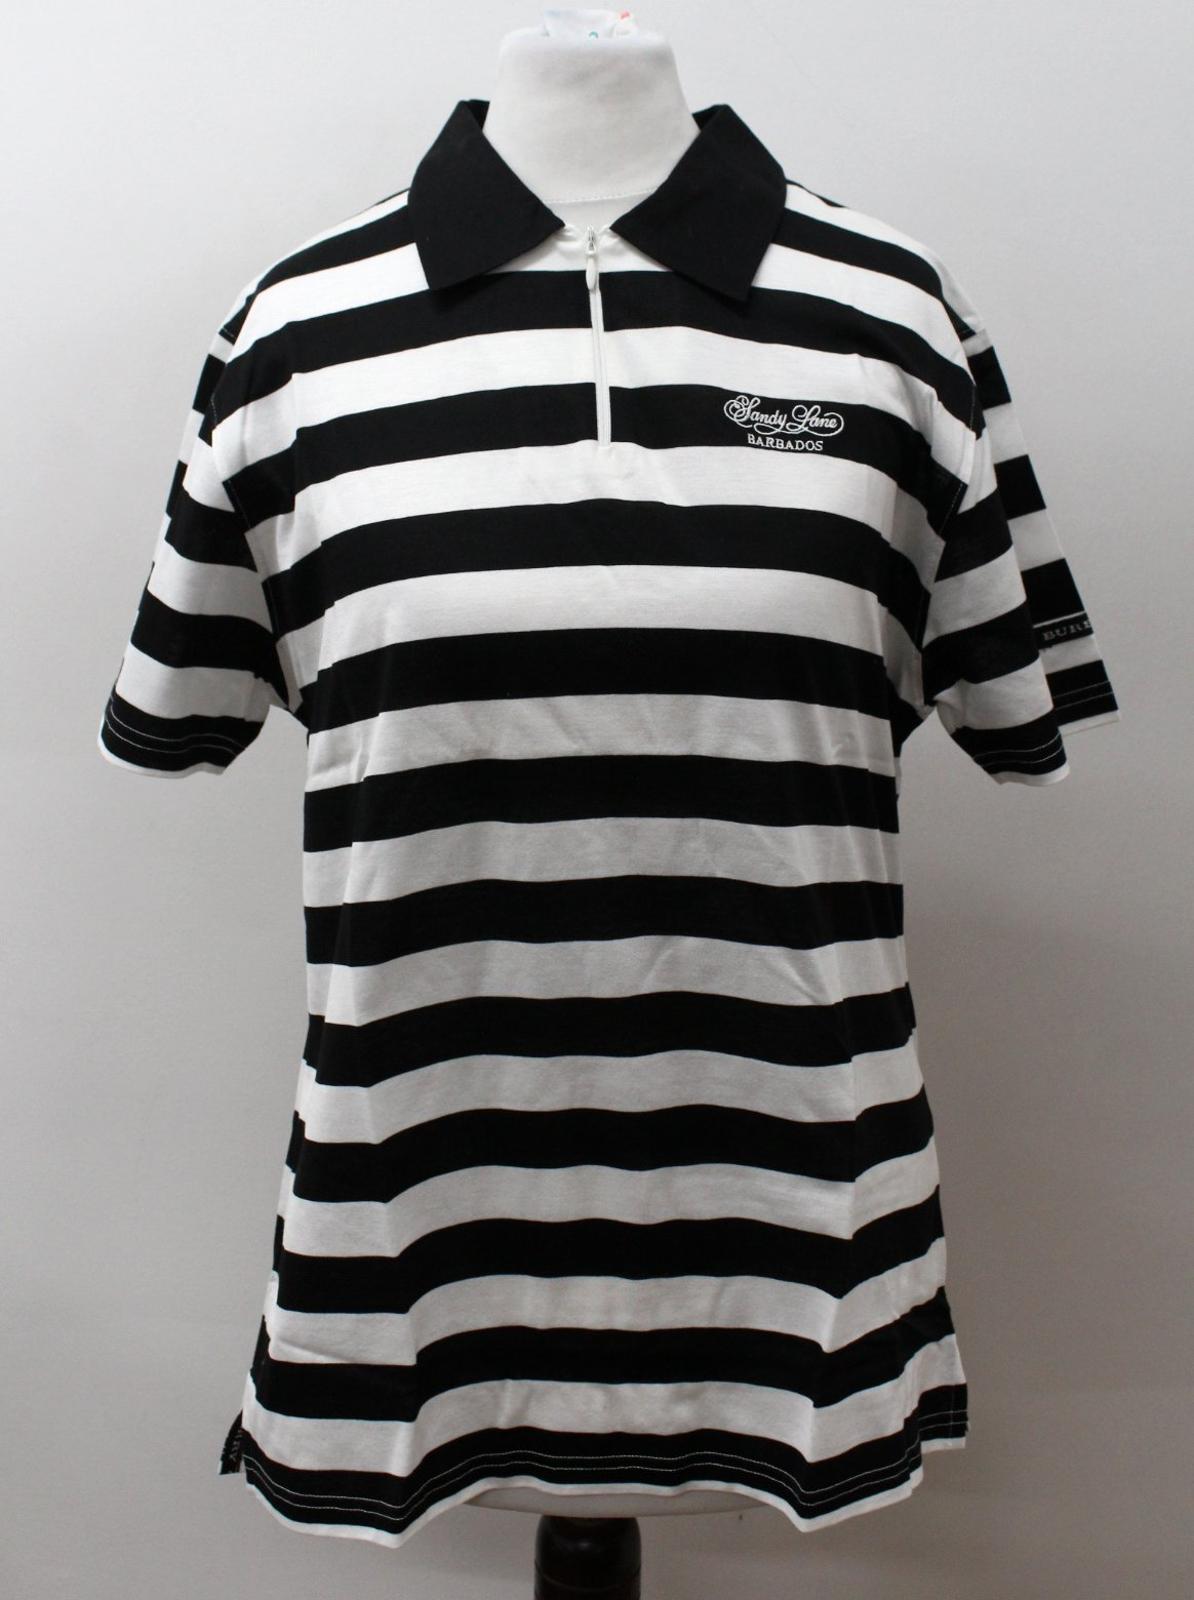 BURBERRY-GOLF-Ladies-Black-White-Cotton-Short-Sleeve-Striped-Polo-Shirt-S-BNWT thumbnail 2